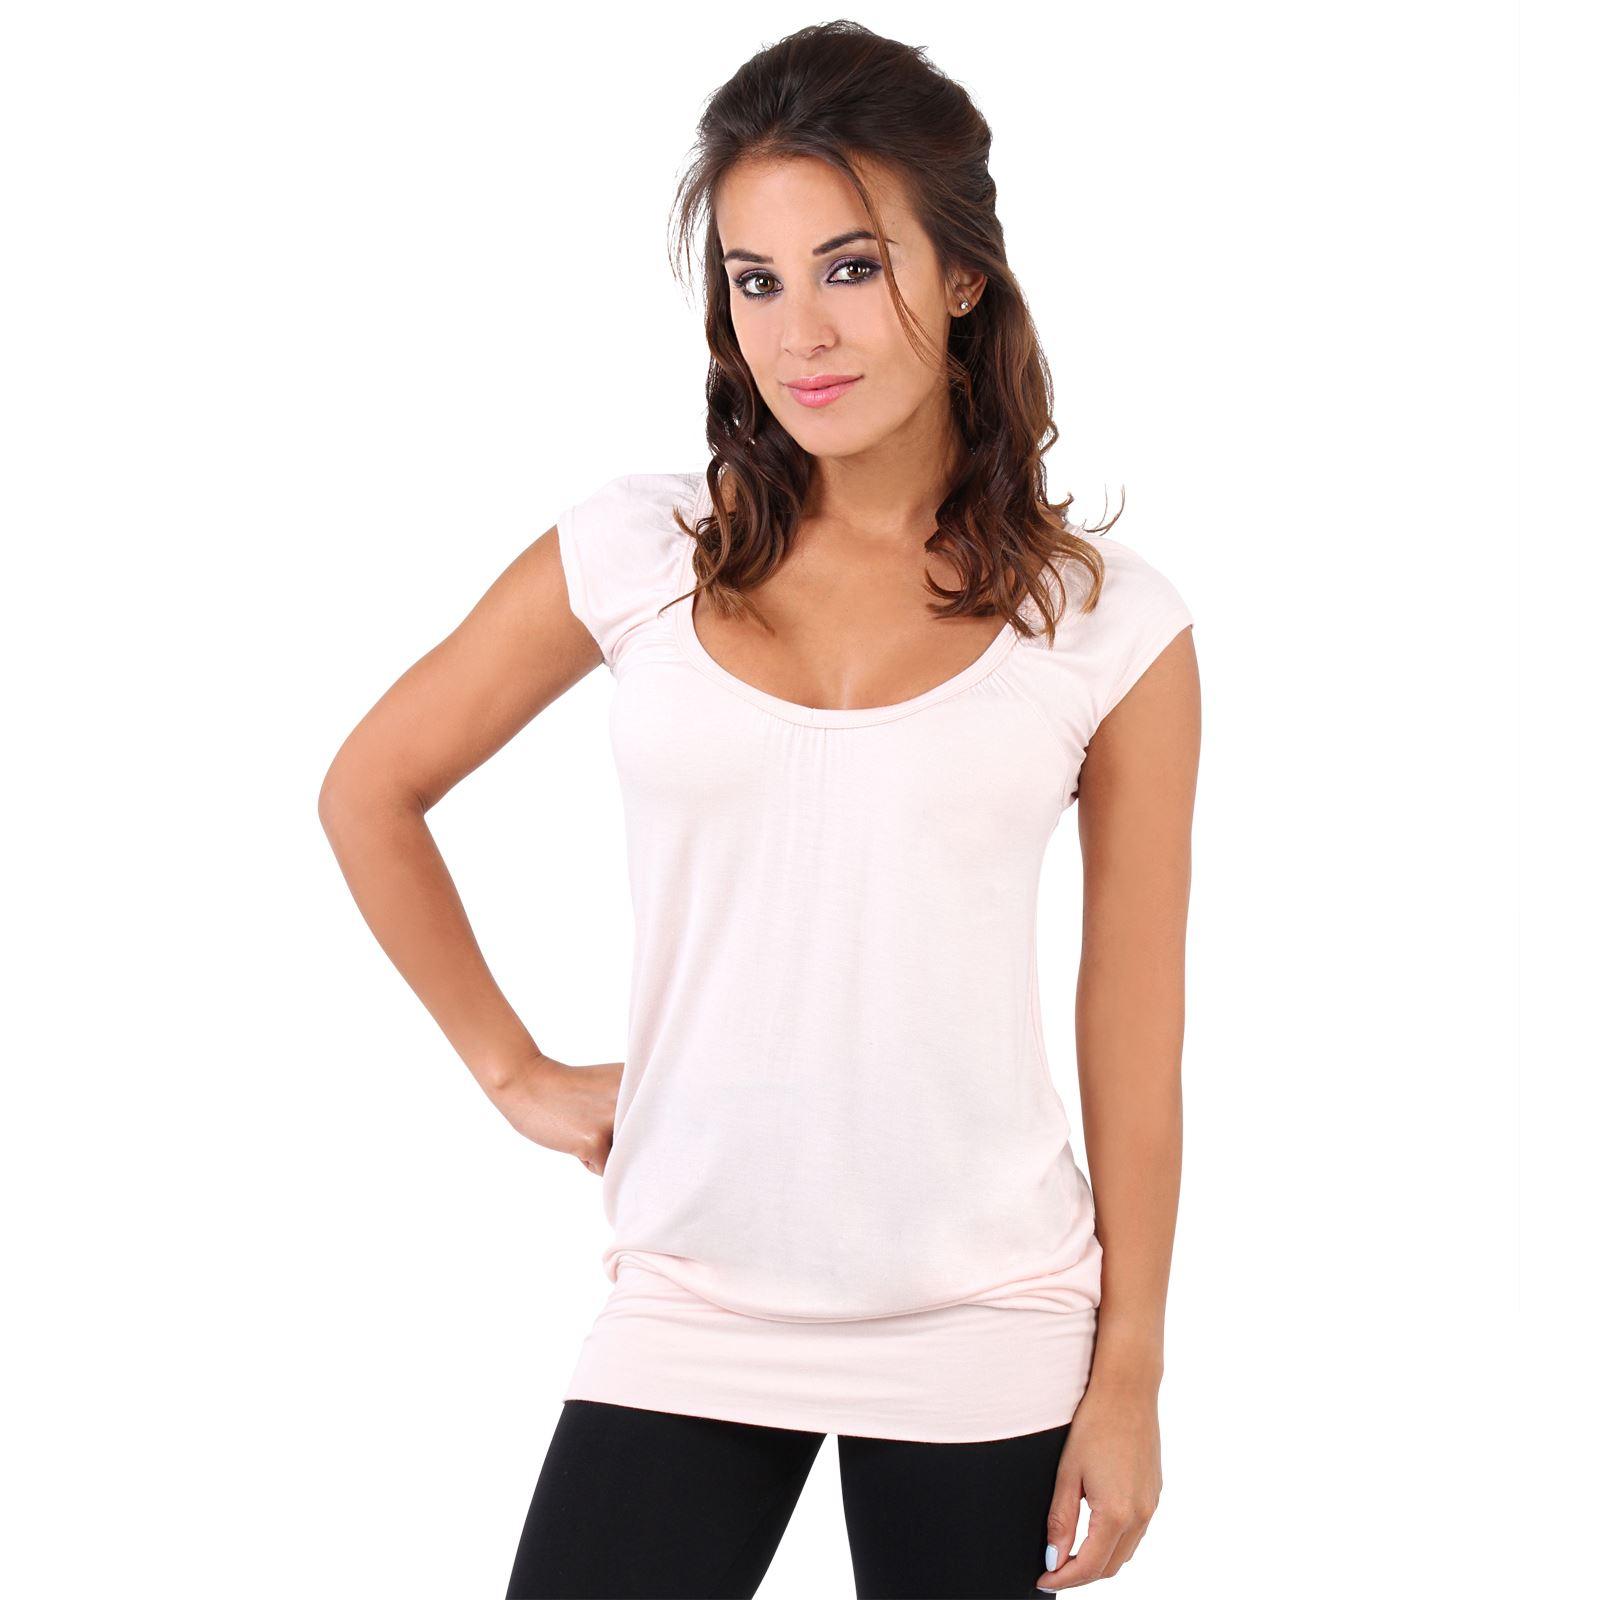 Womens-Ladies-Scoop-Neck-Blouse-V-T-Shirt-Long-Short-Sleeve-Plain-Loose-Top thumbnail 35